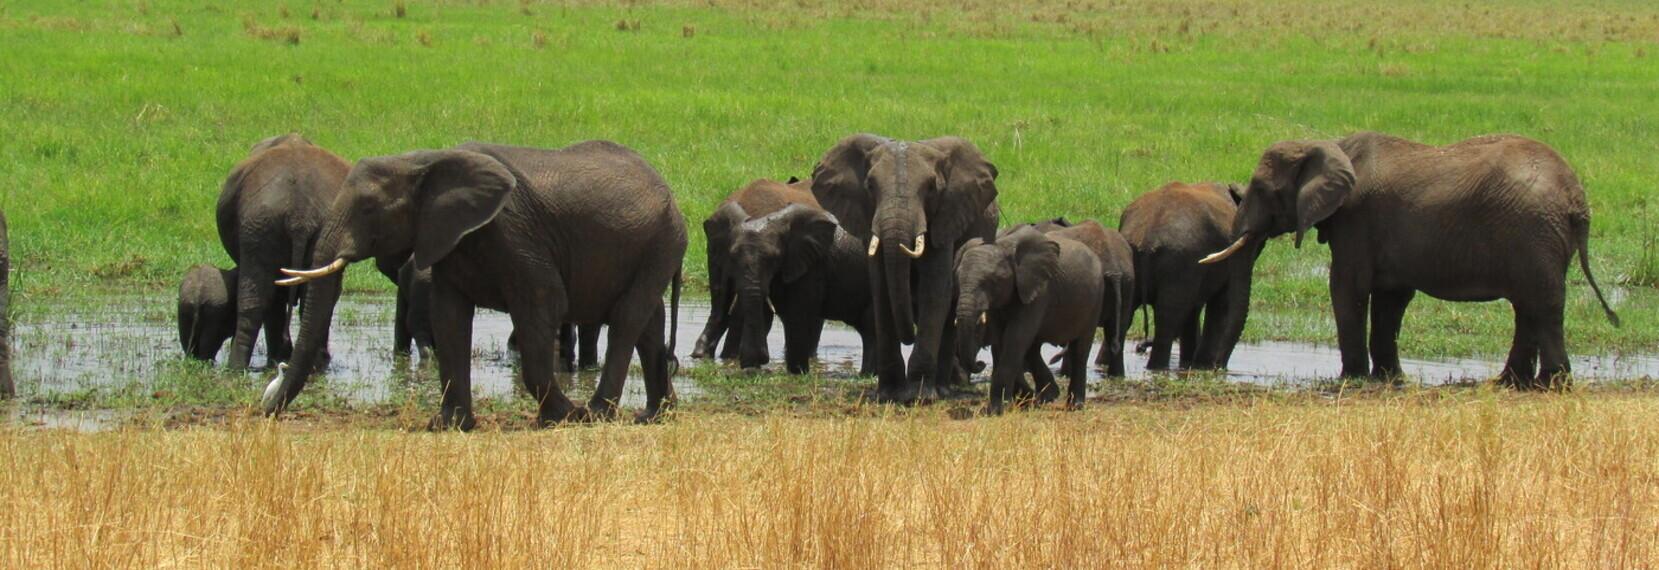 About Kiwoito Africa Safaris